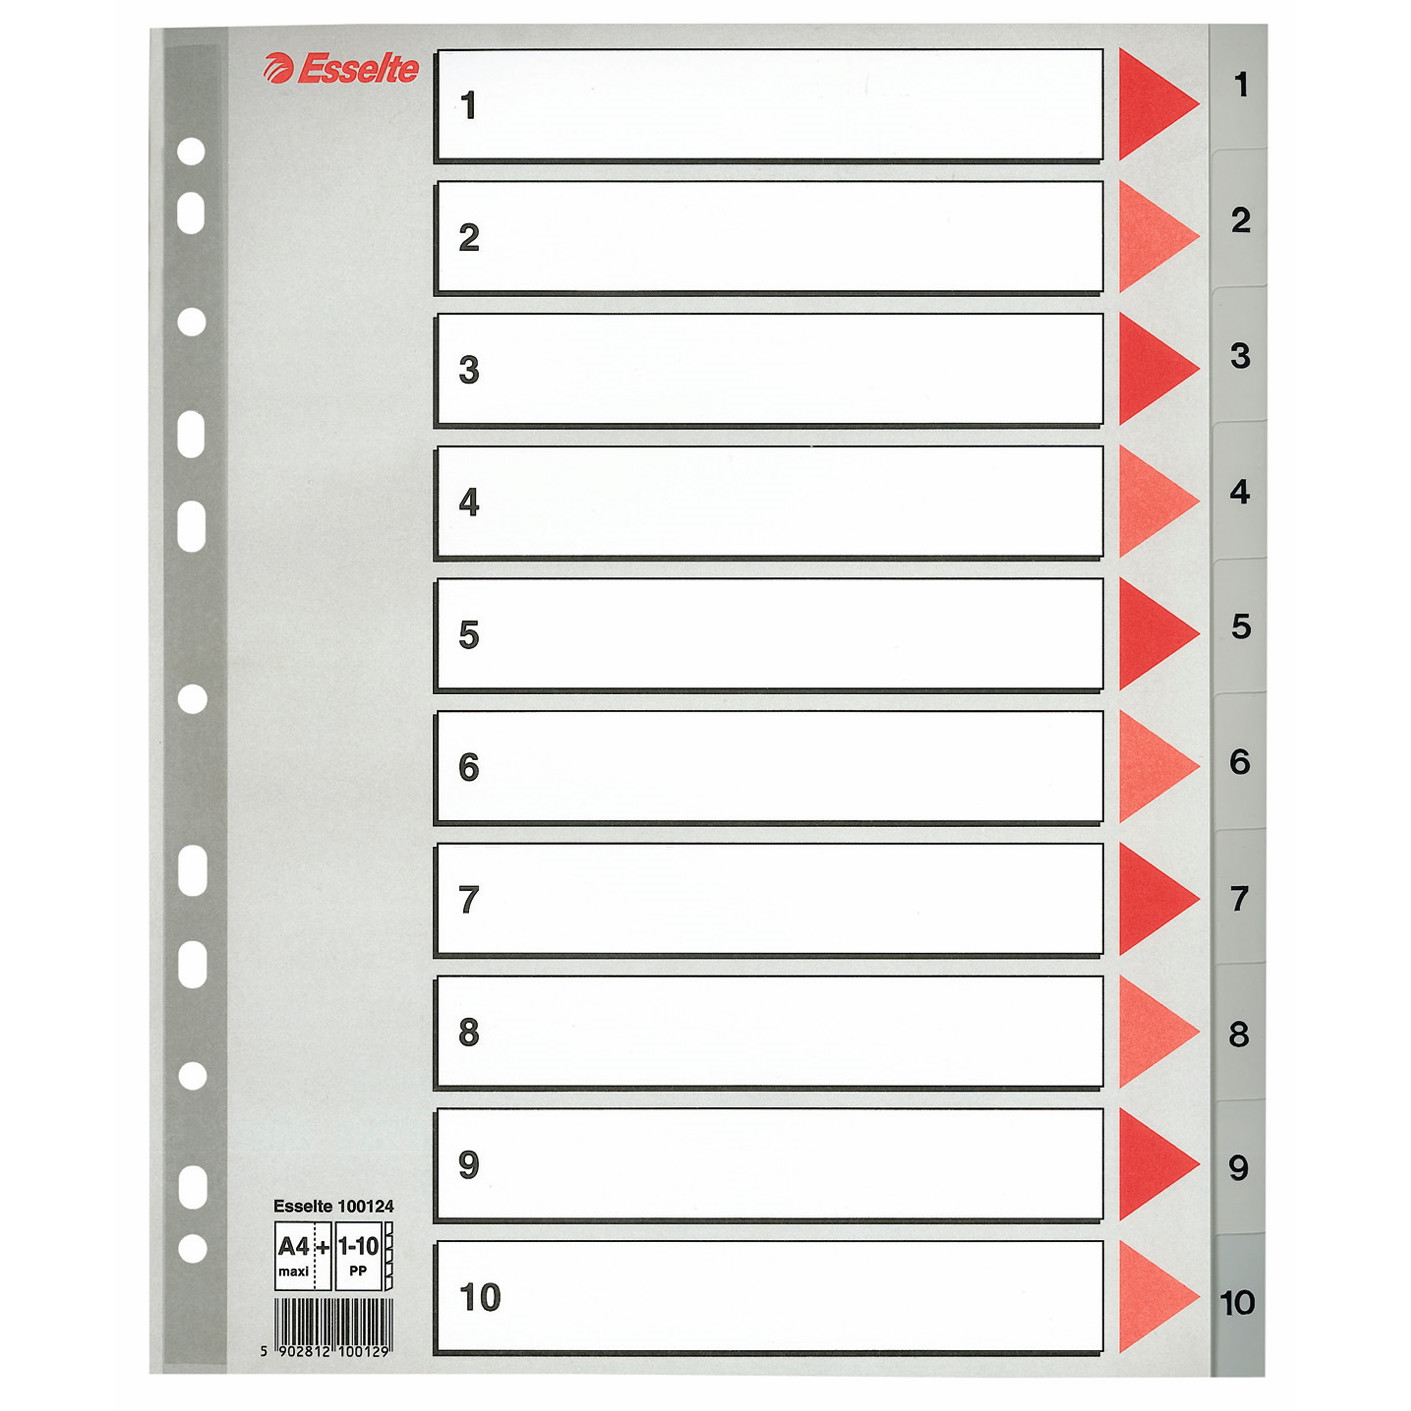 A4 maxi plastregister Esselte 1-10 - grå faner i plast med kartonforblad